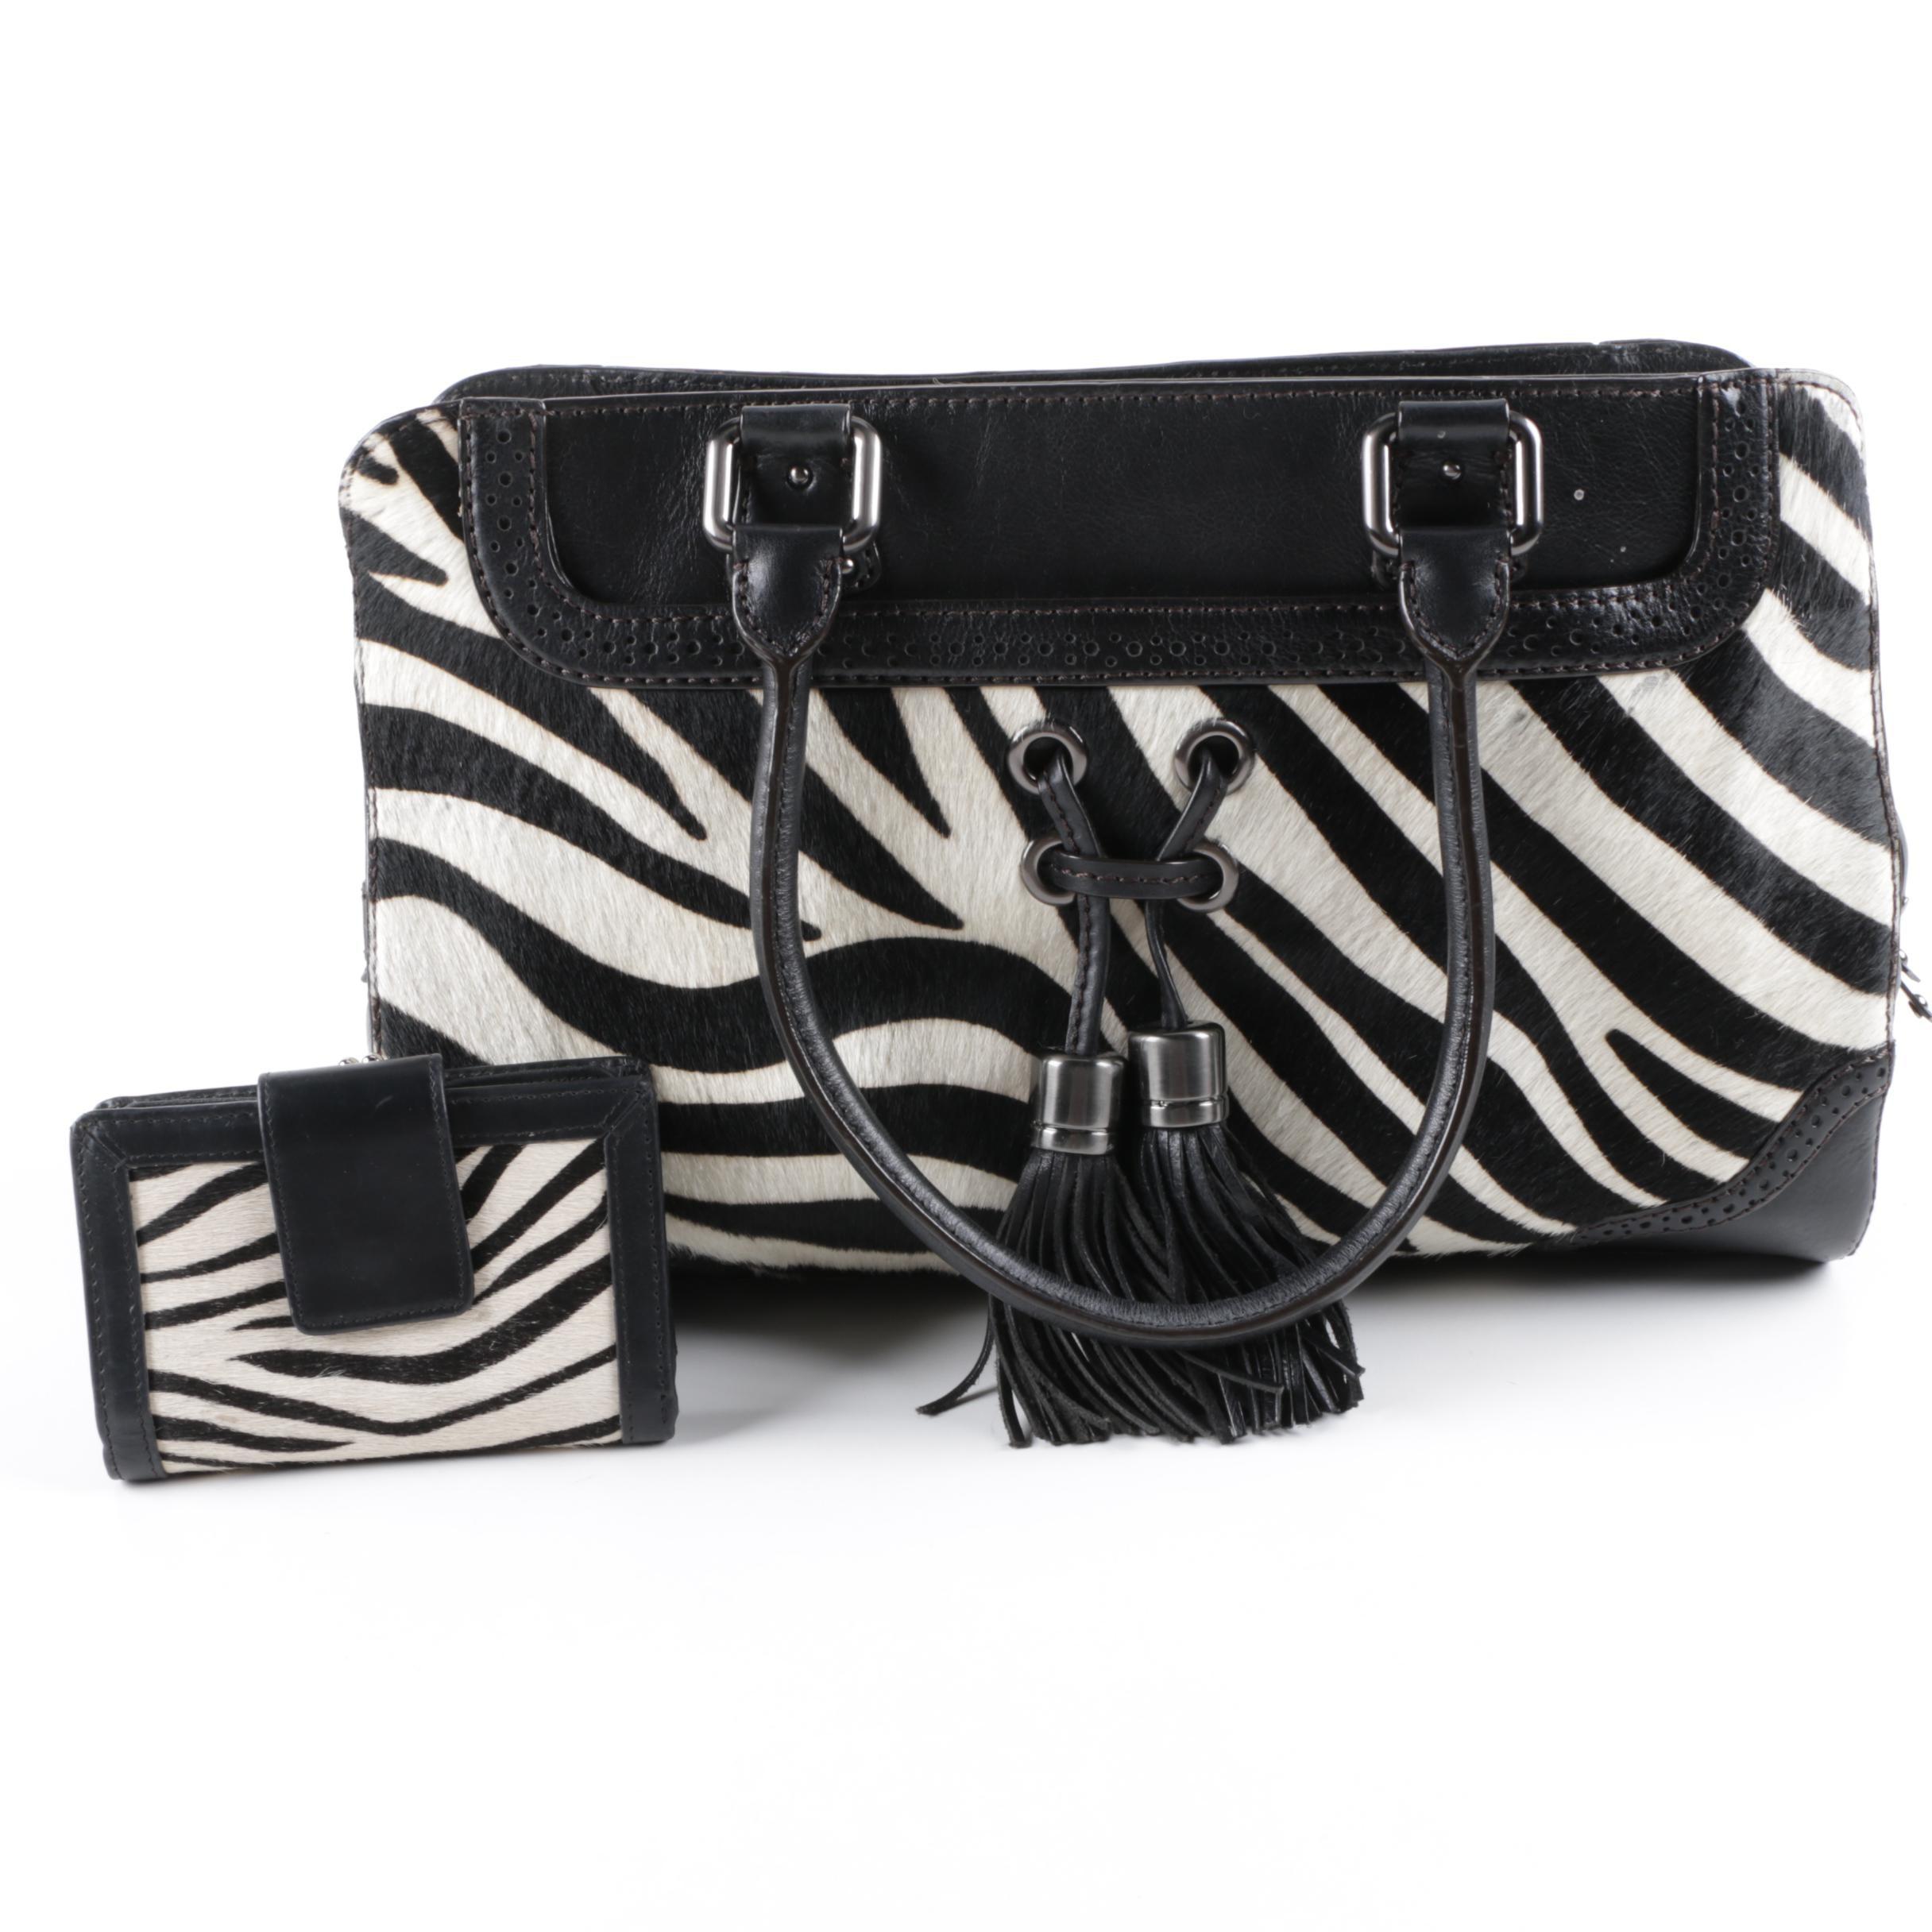 Antonio Melani Zebra Print Pony Hair Handbag and Wallet